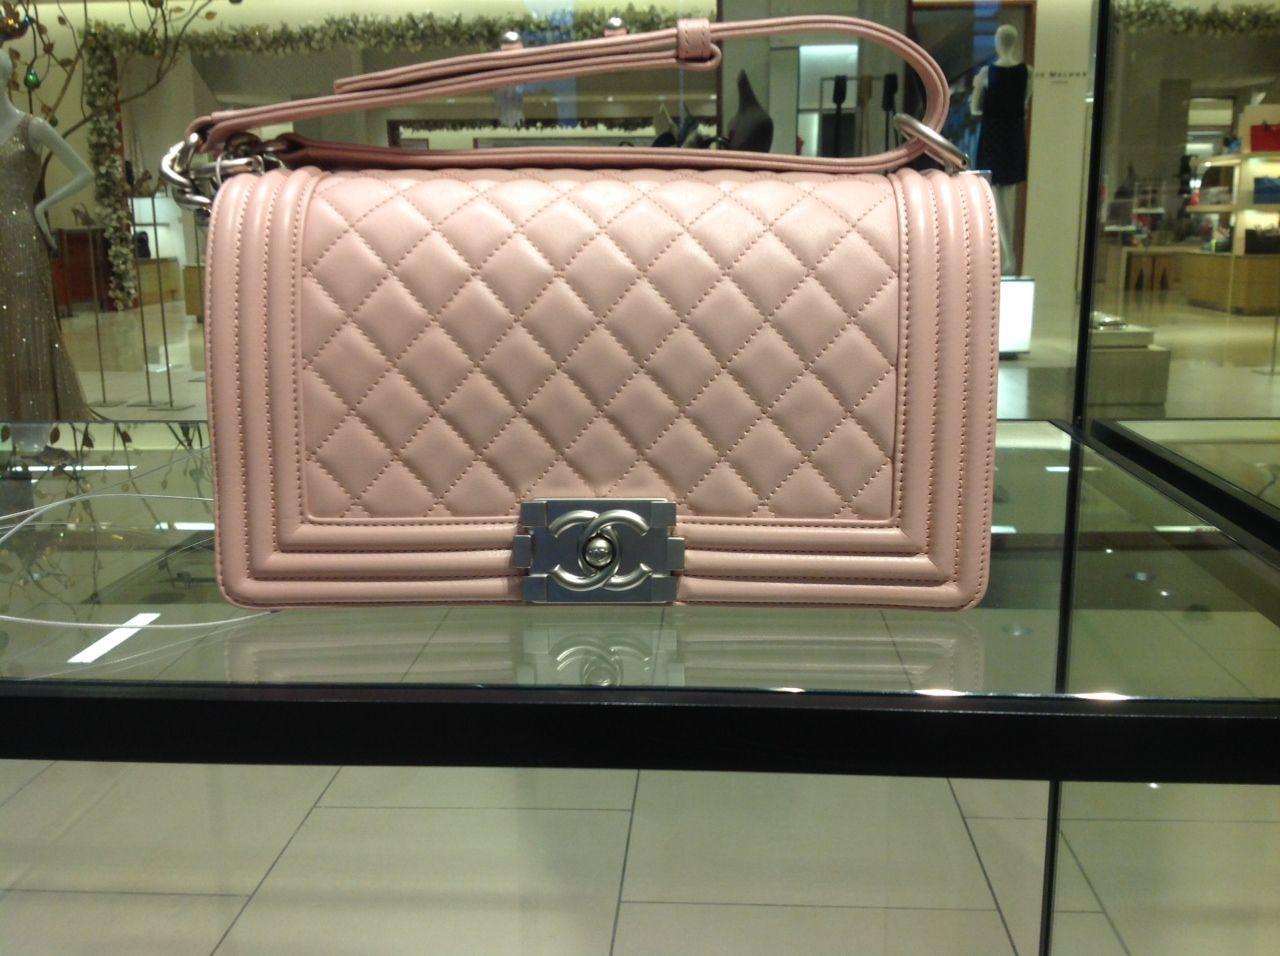 My Second Chanel Handbag This Is From The Dubai Cruise Collection Pale Pink Medium Boy Handbag With Ruthenium Hardware Chanel Handbags Chanel Chanel Boy Bag